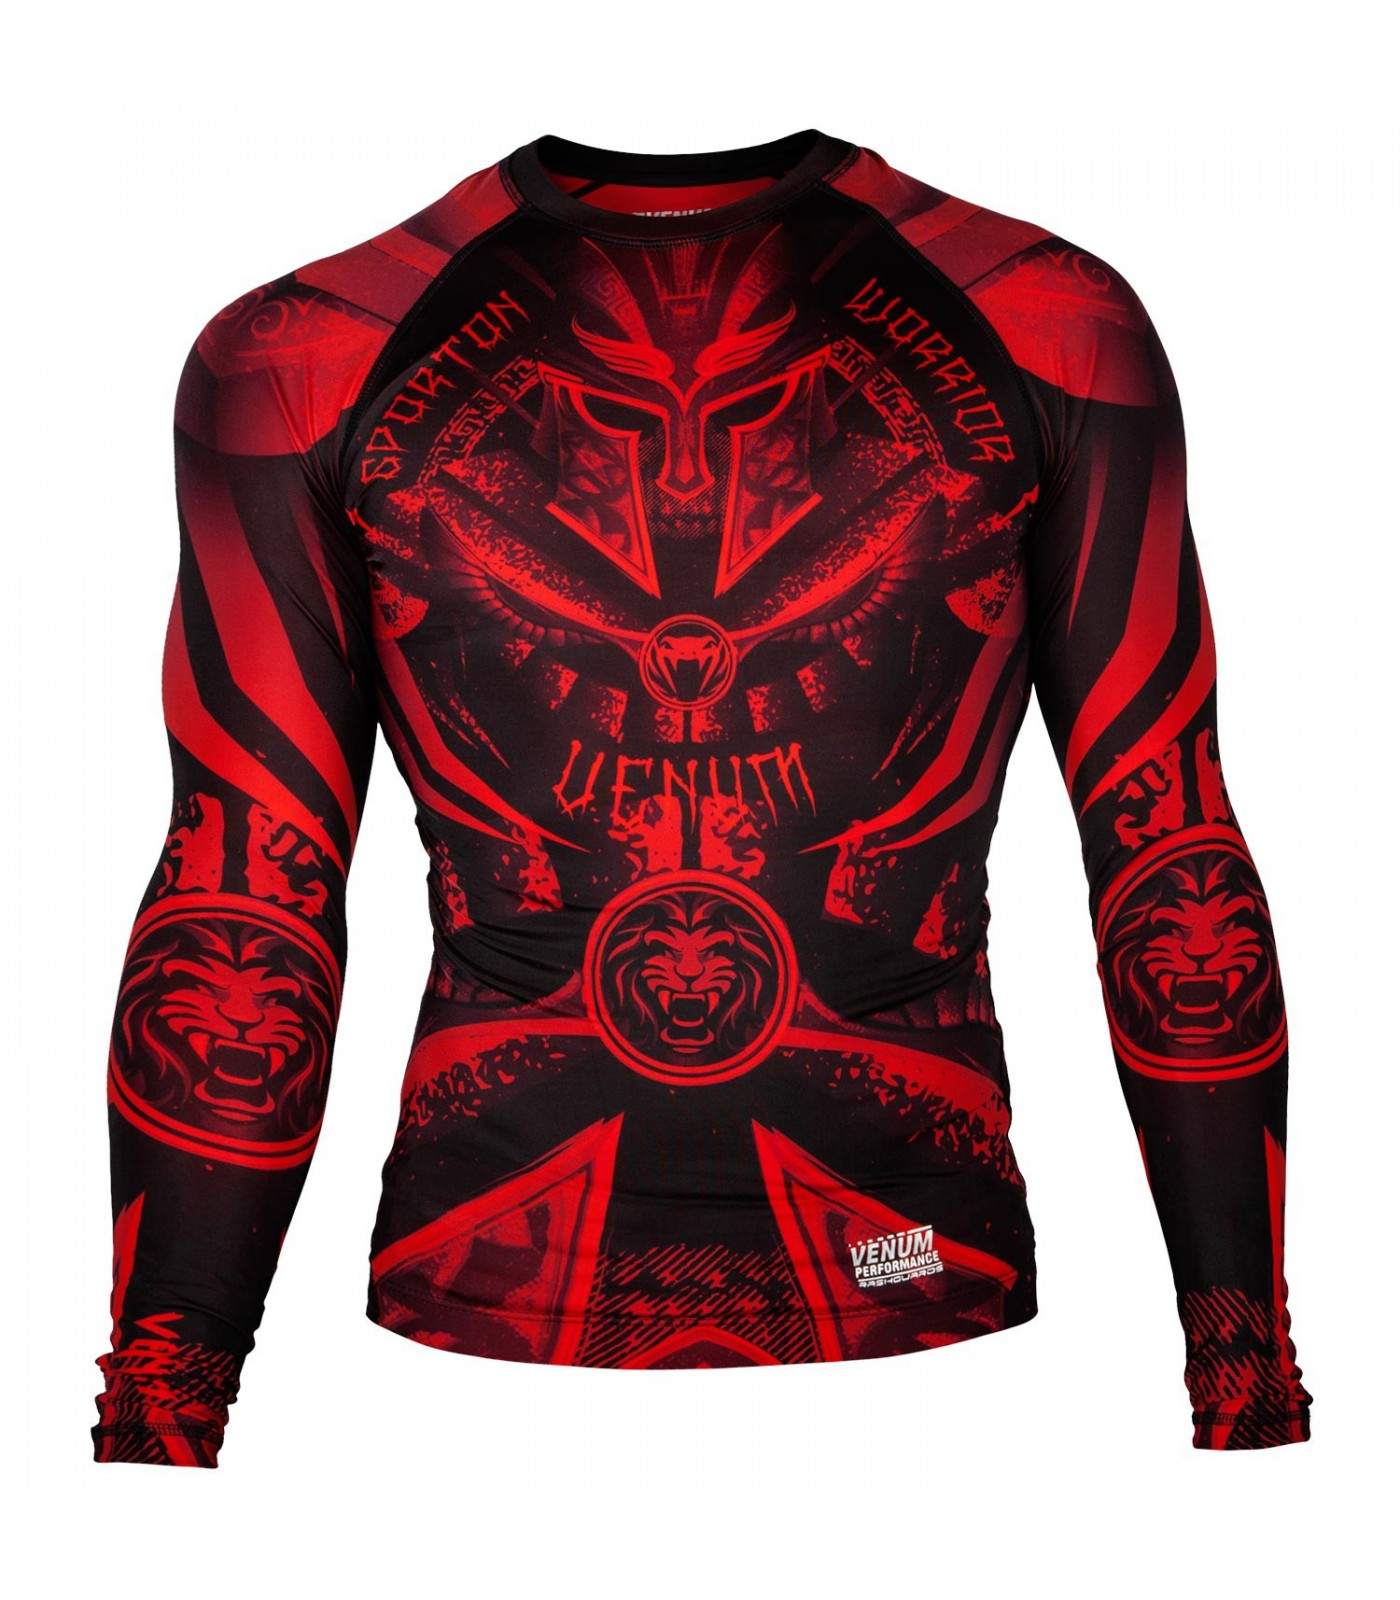 РАШГАРД - Venum Gladiator 3.0 Red Devil Rashguard - Black/Red - Long Sleeves